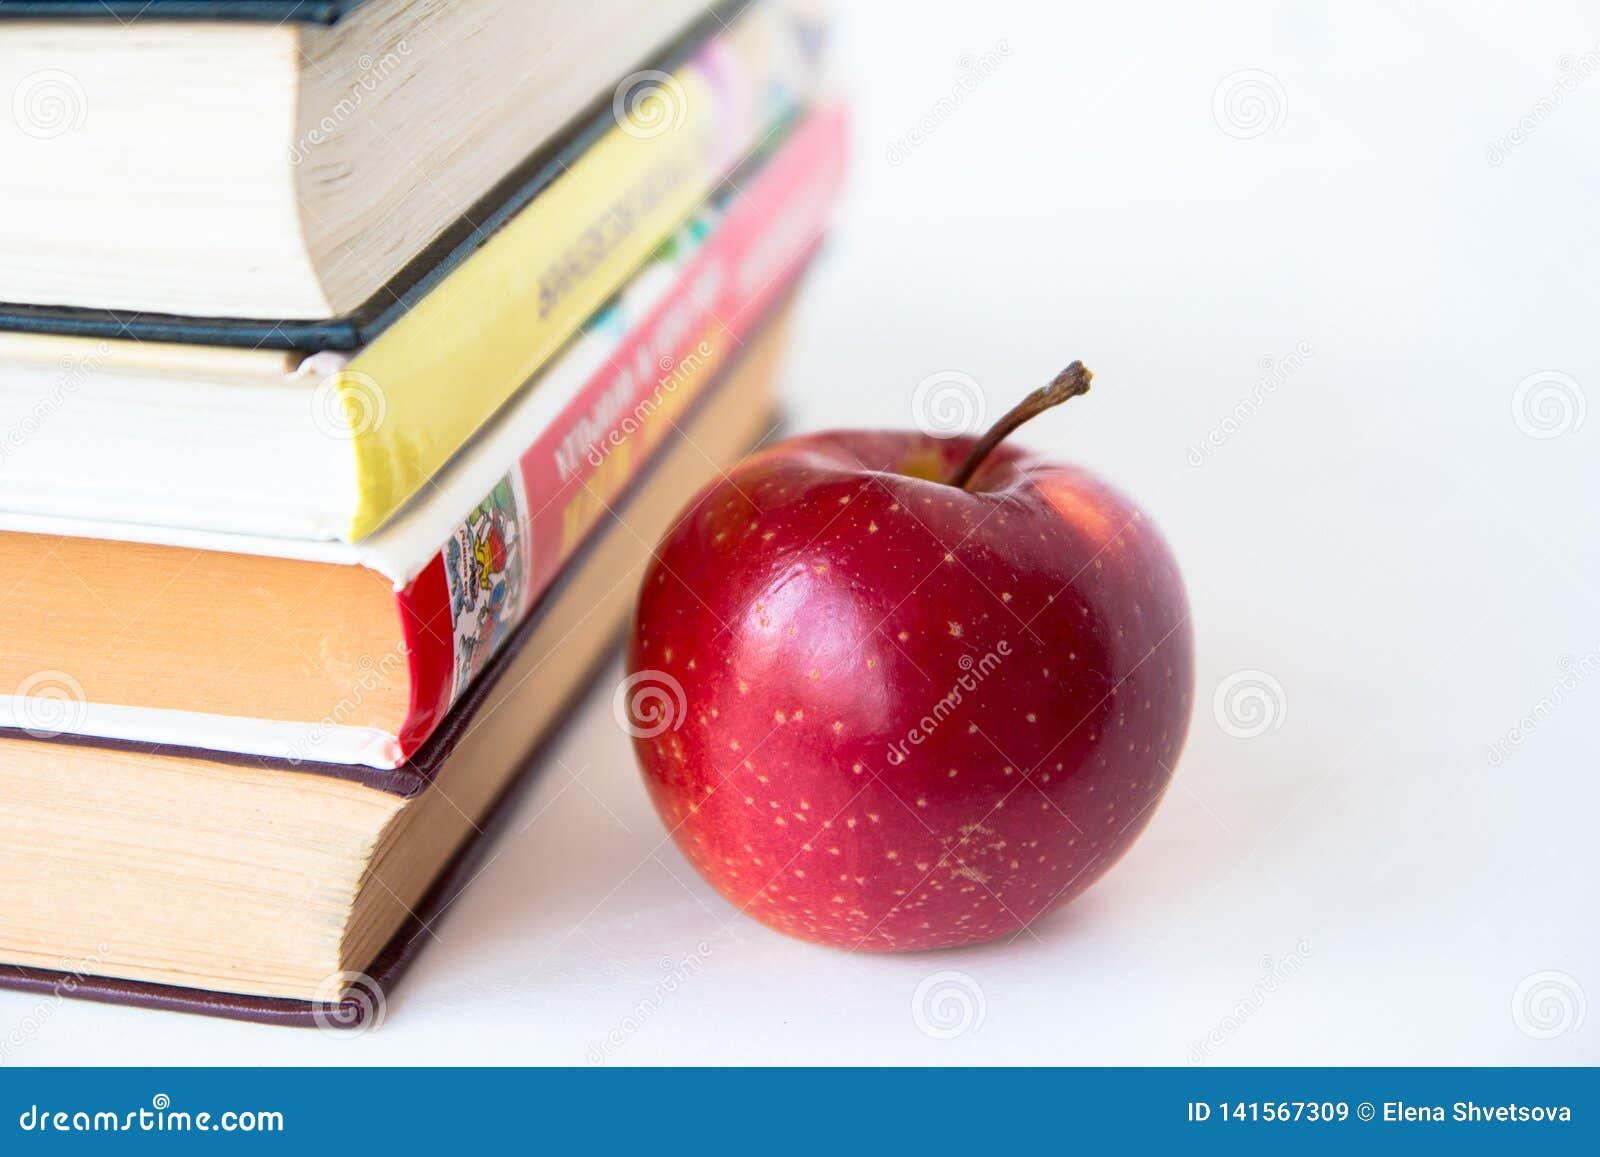 Red mature juicy apple near books.